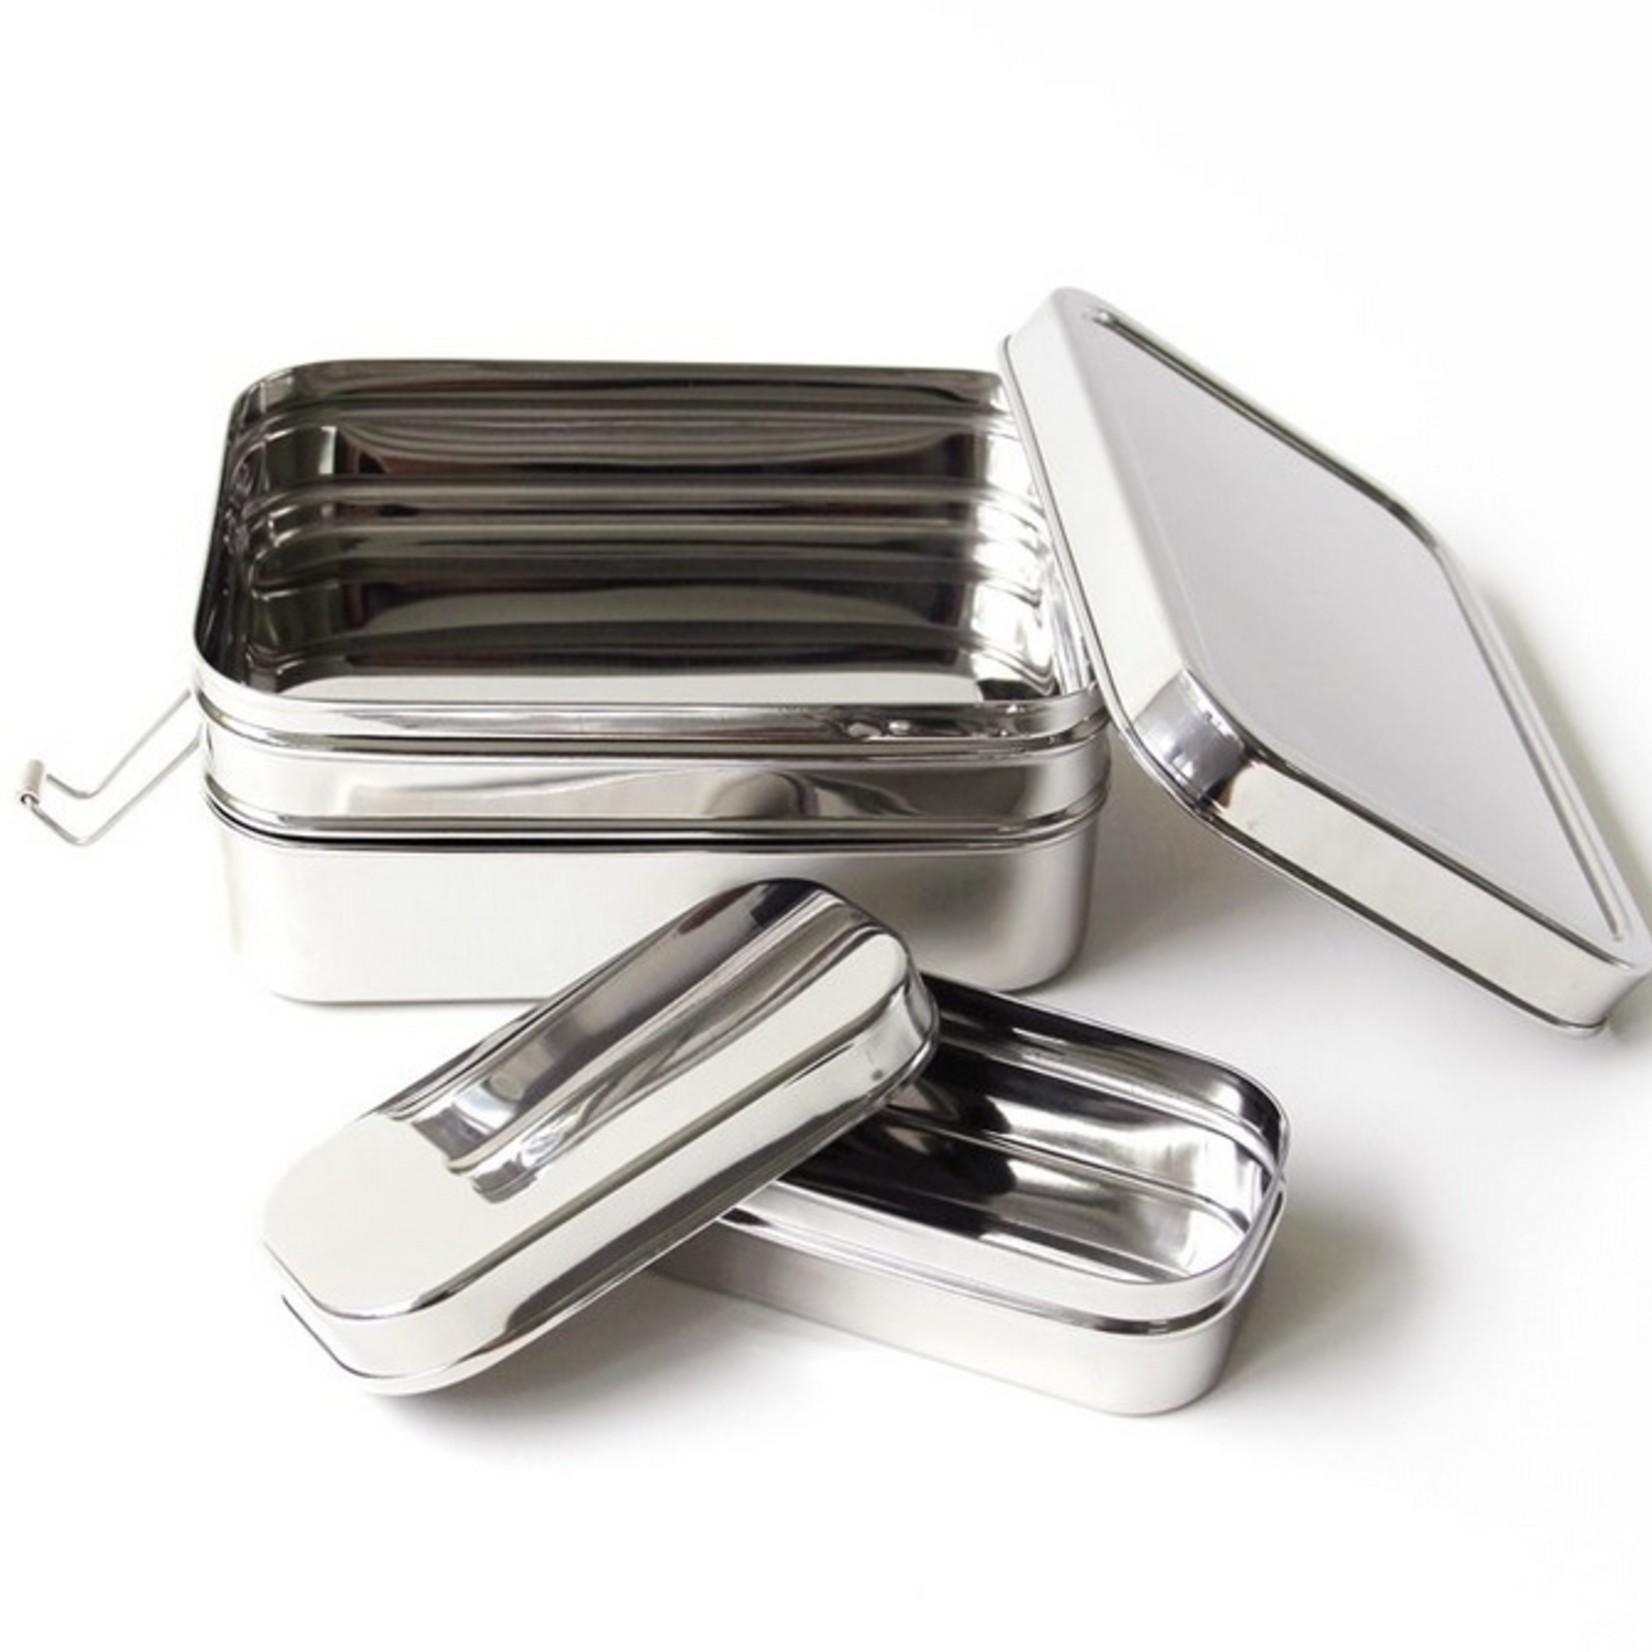 ECOlunchbox Stapelbare Lunchbox Three-in-one